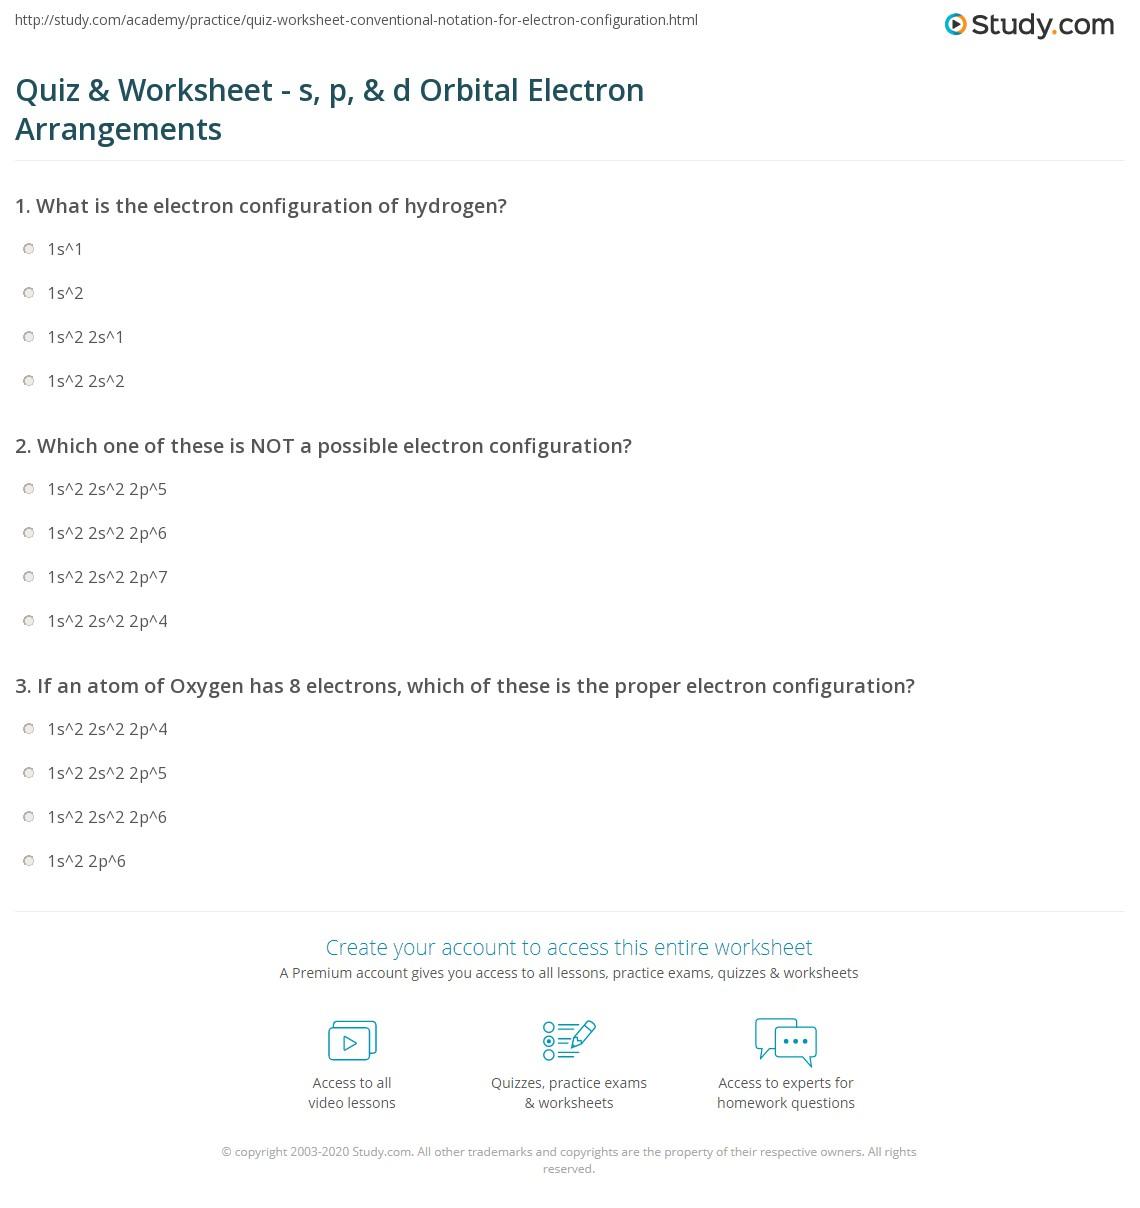 Quiz & Worksheet - s, p, & d Orbital Electron Arrangements | Study.com